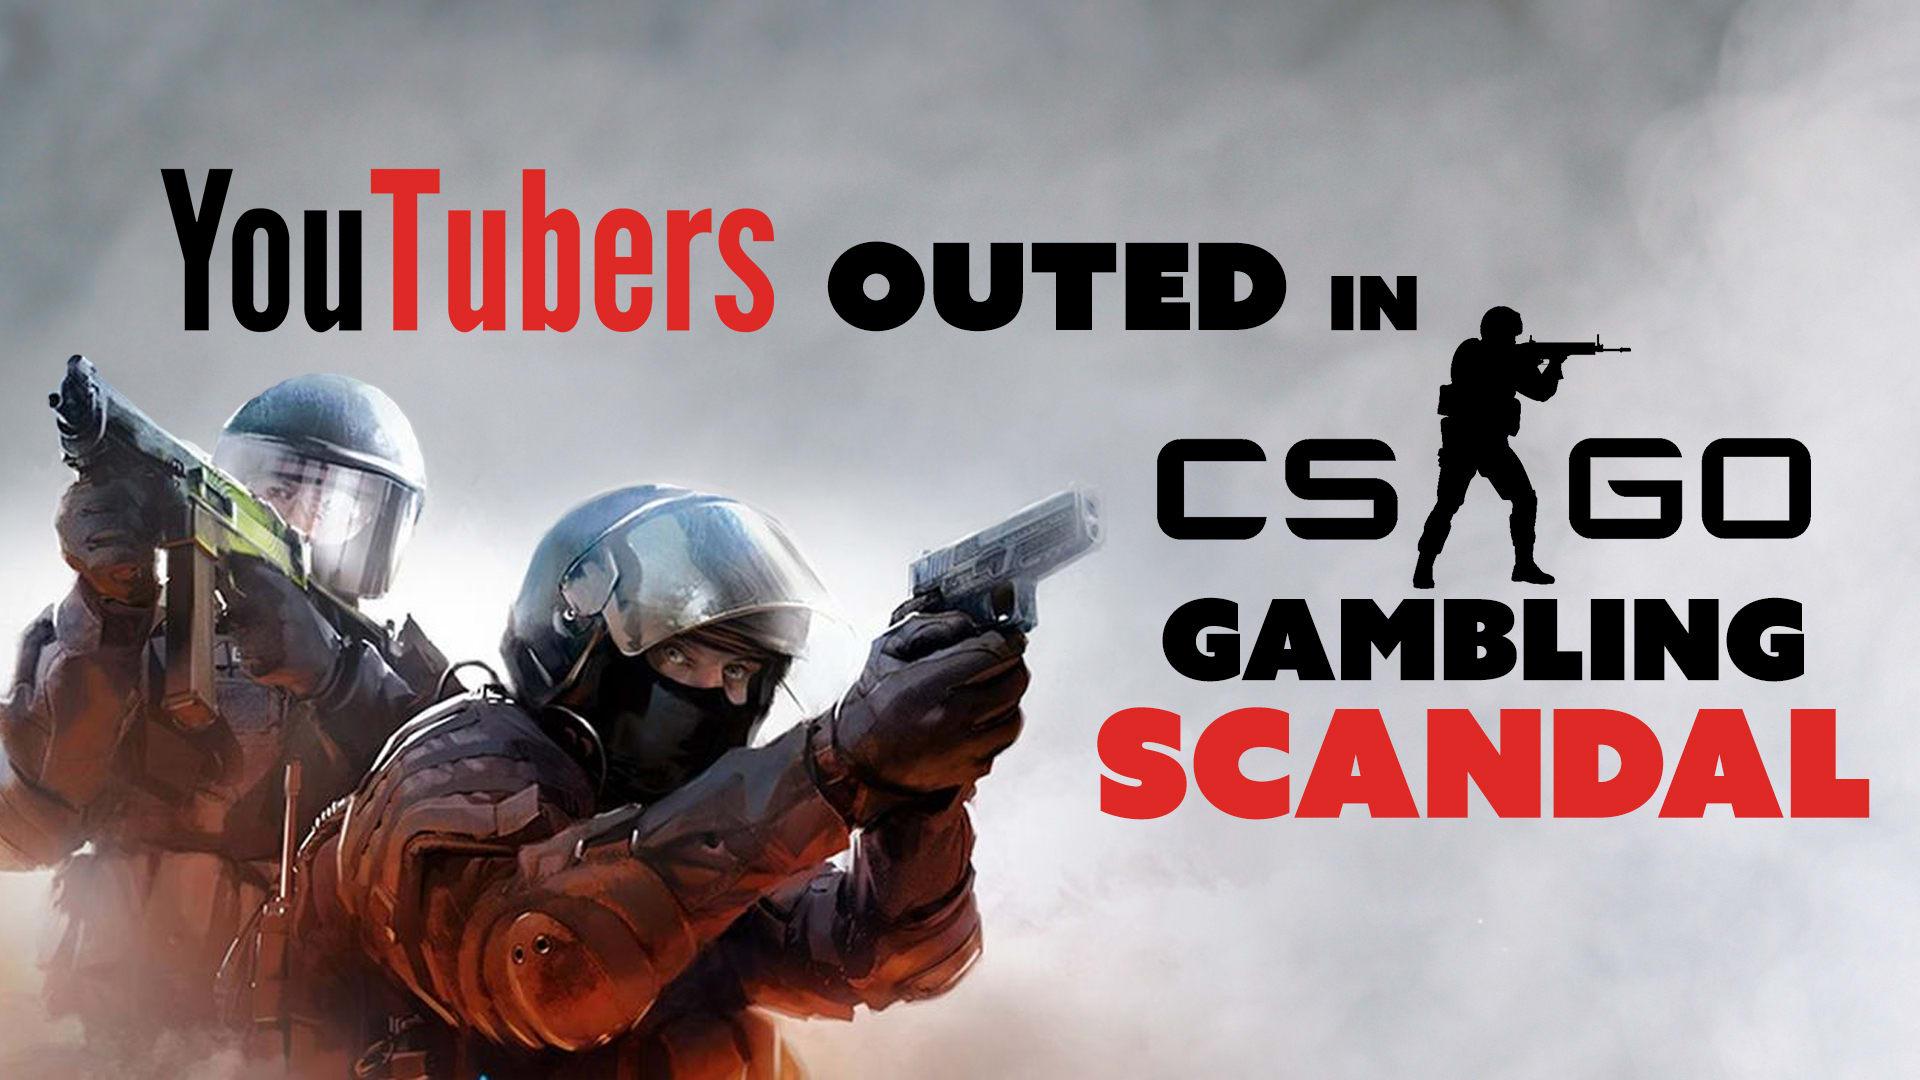 YouTubers Caught In CSGO Gambling Scandal - Rooster Teeth